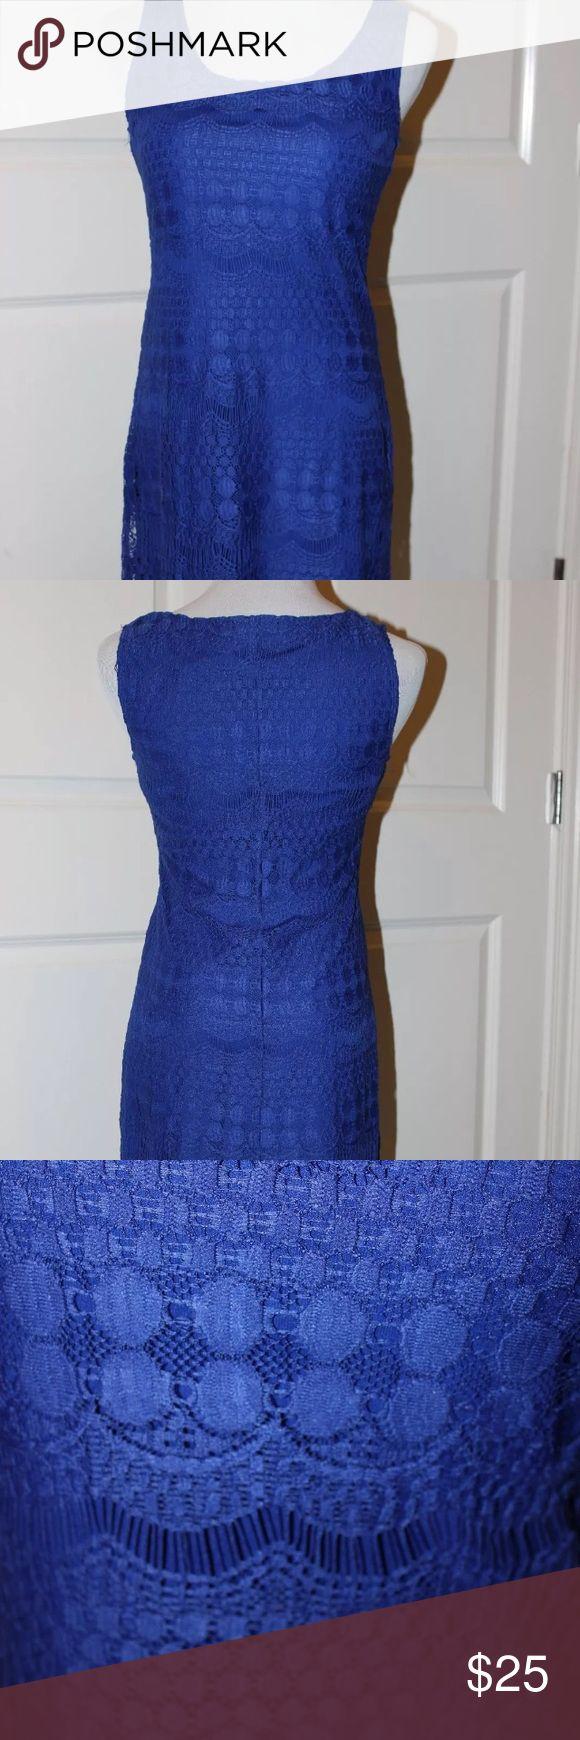 Tiana b dress Gorgeous royal blue sleeveless dress Tiana b Dresses